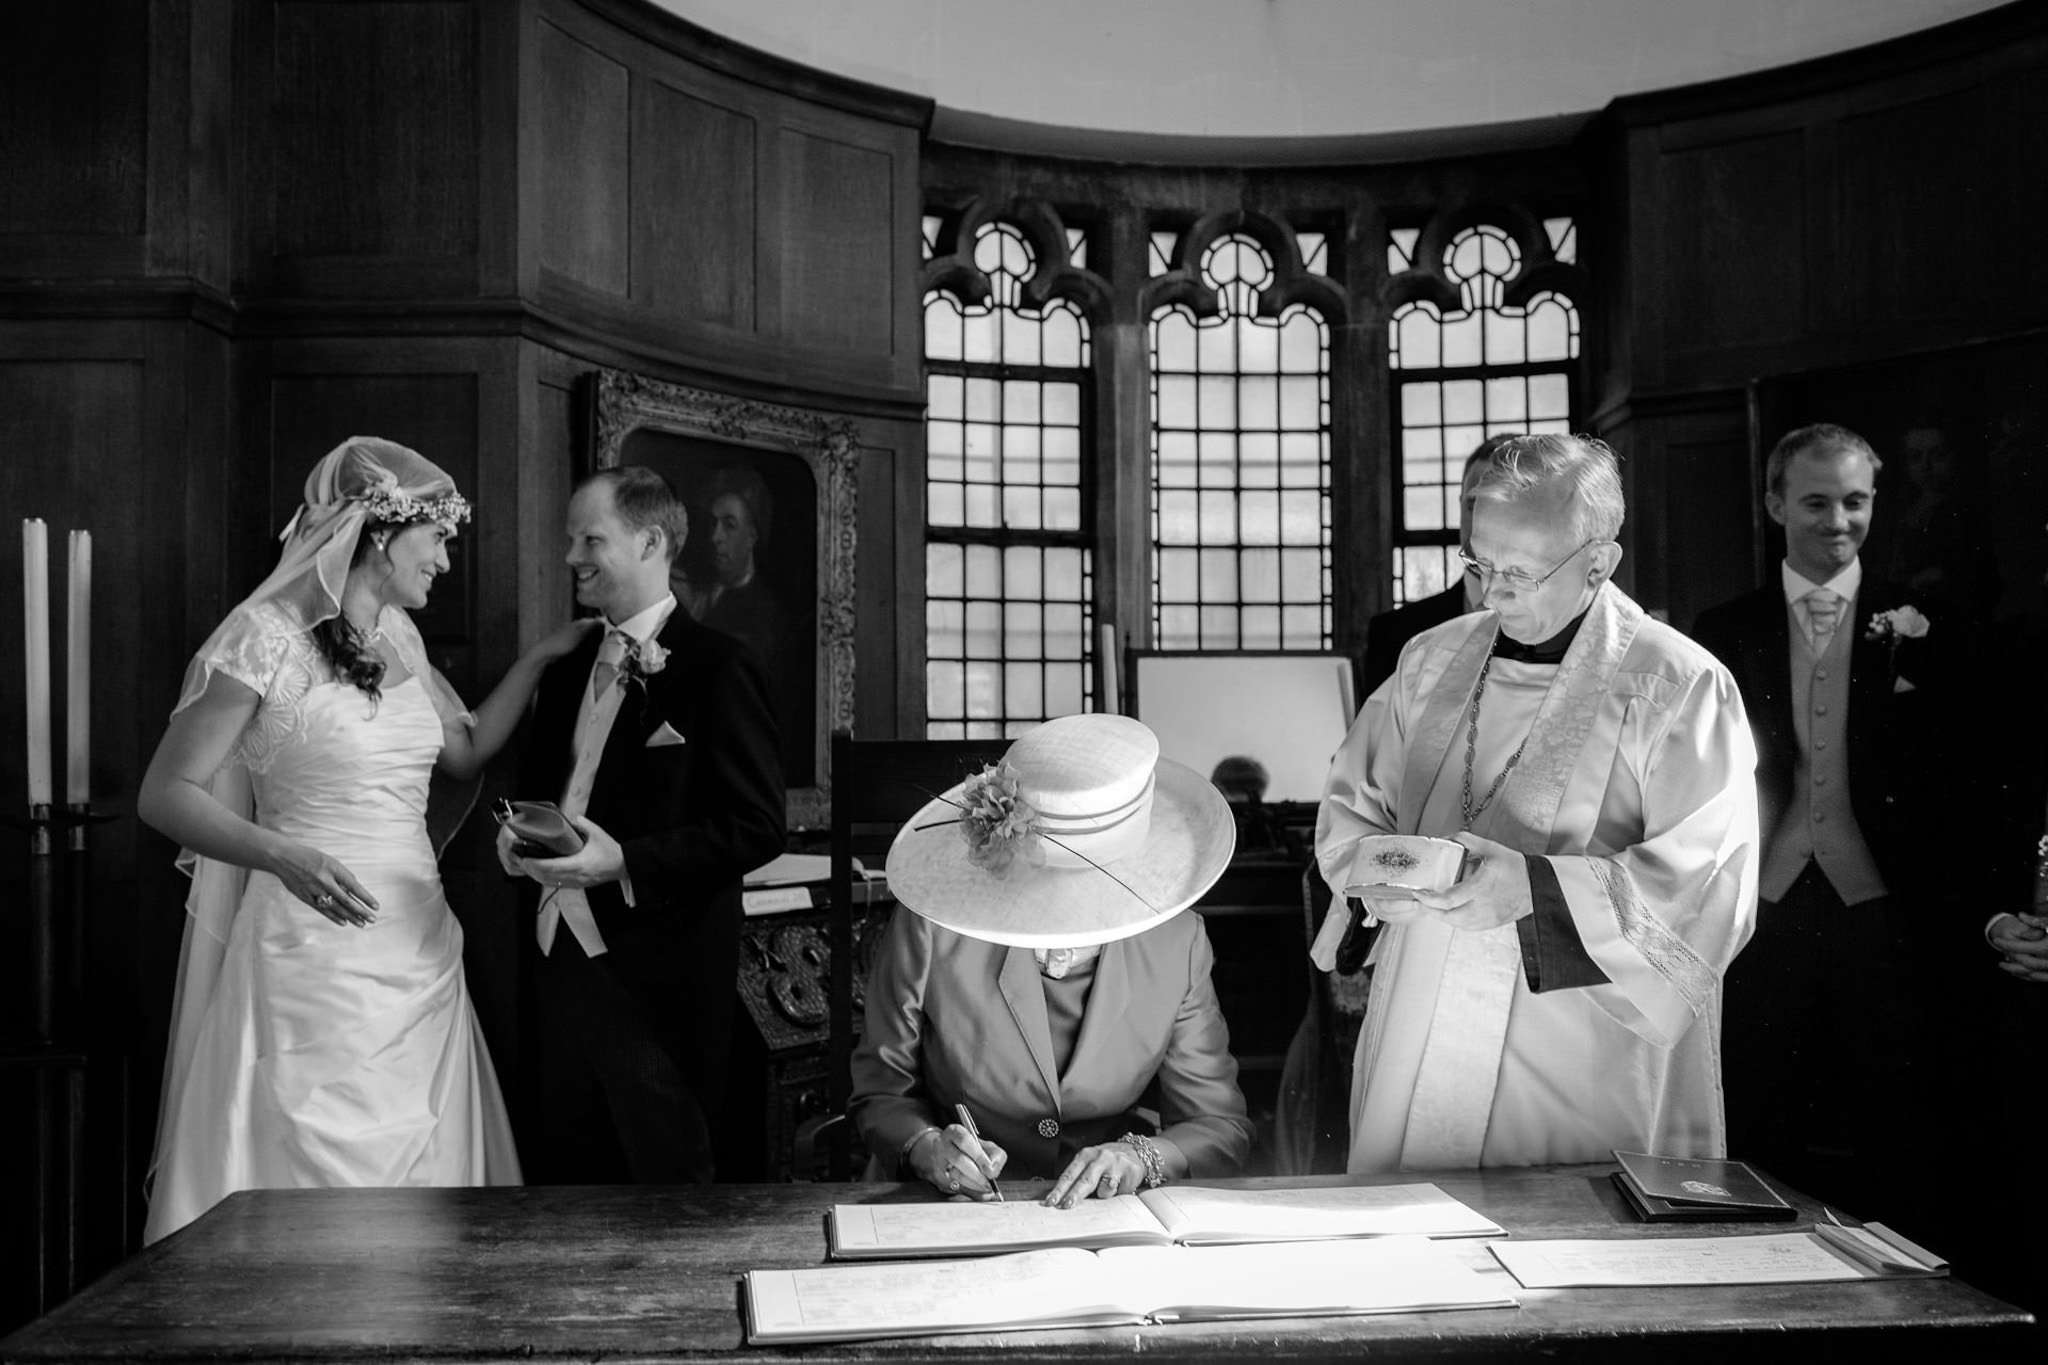 St. Pancras hotel wedding mother of the bride sining the registrar